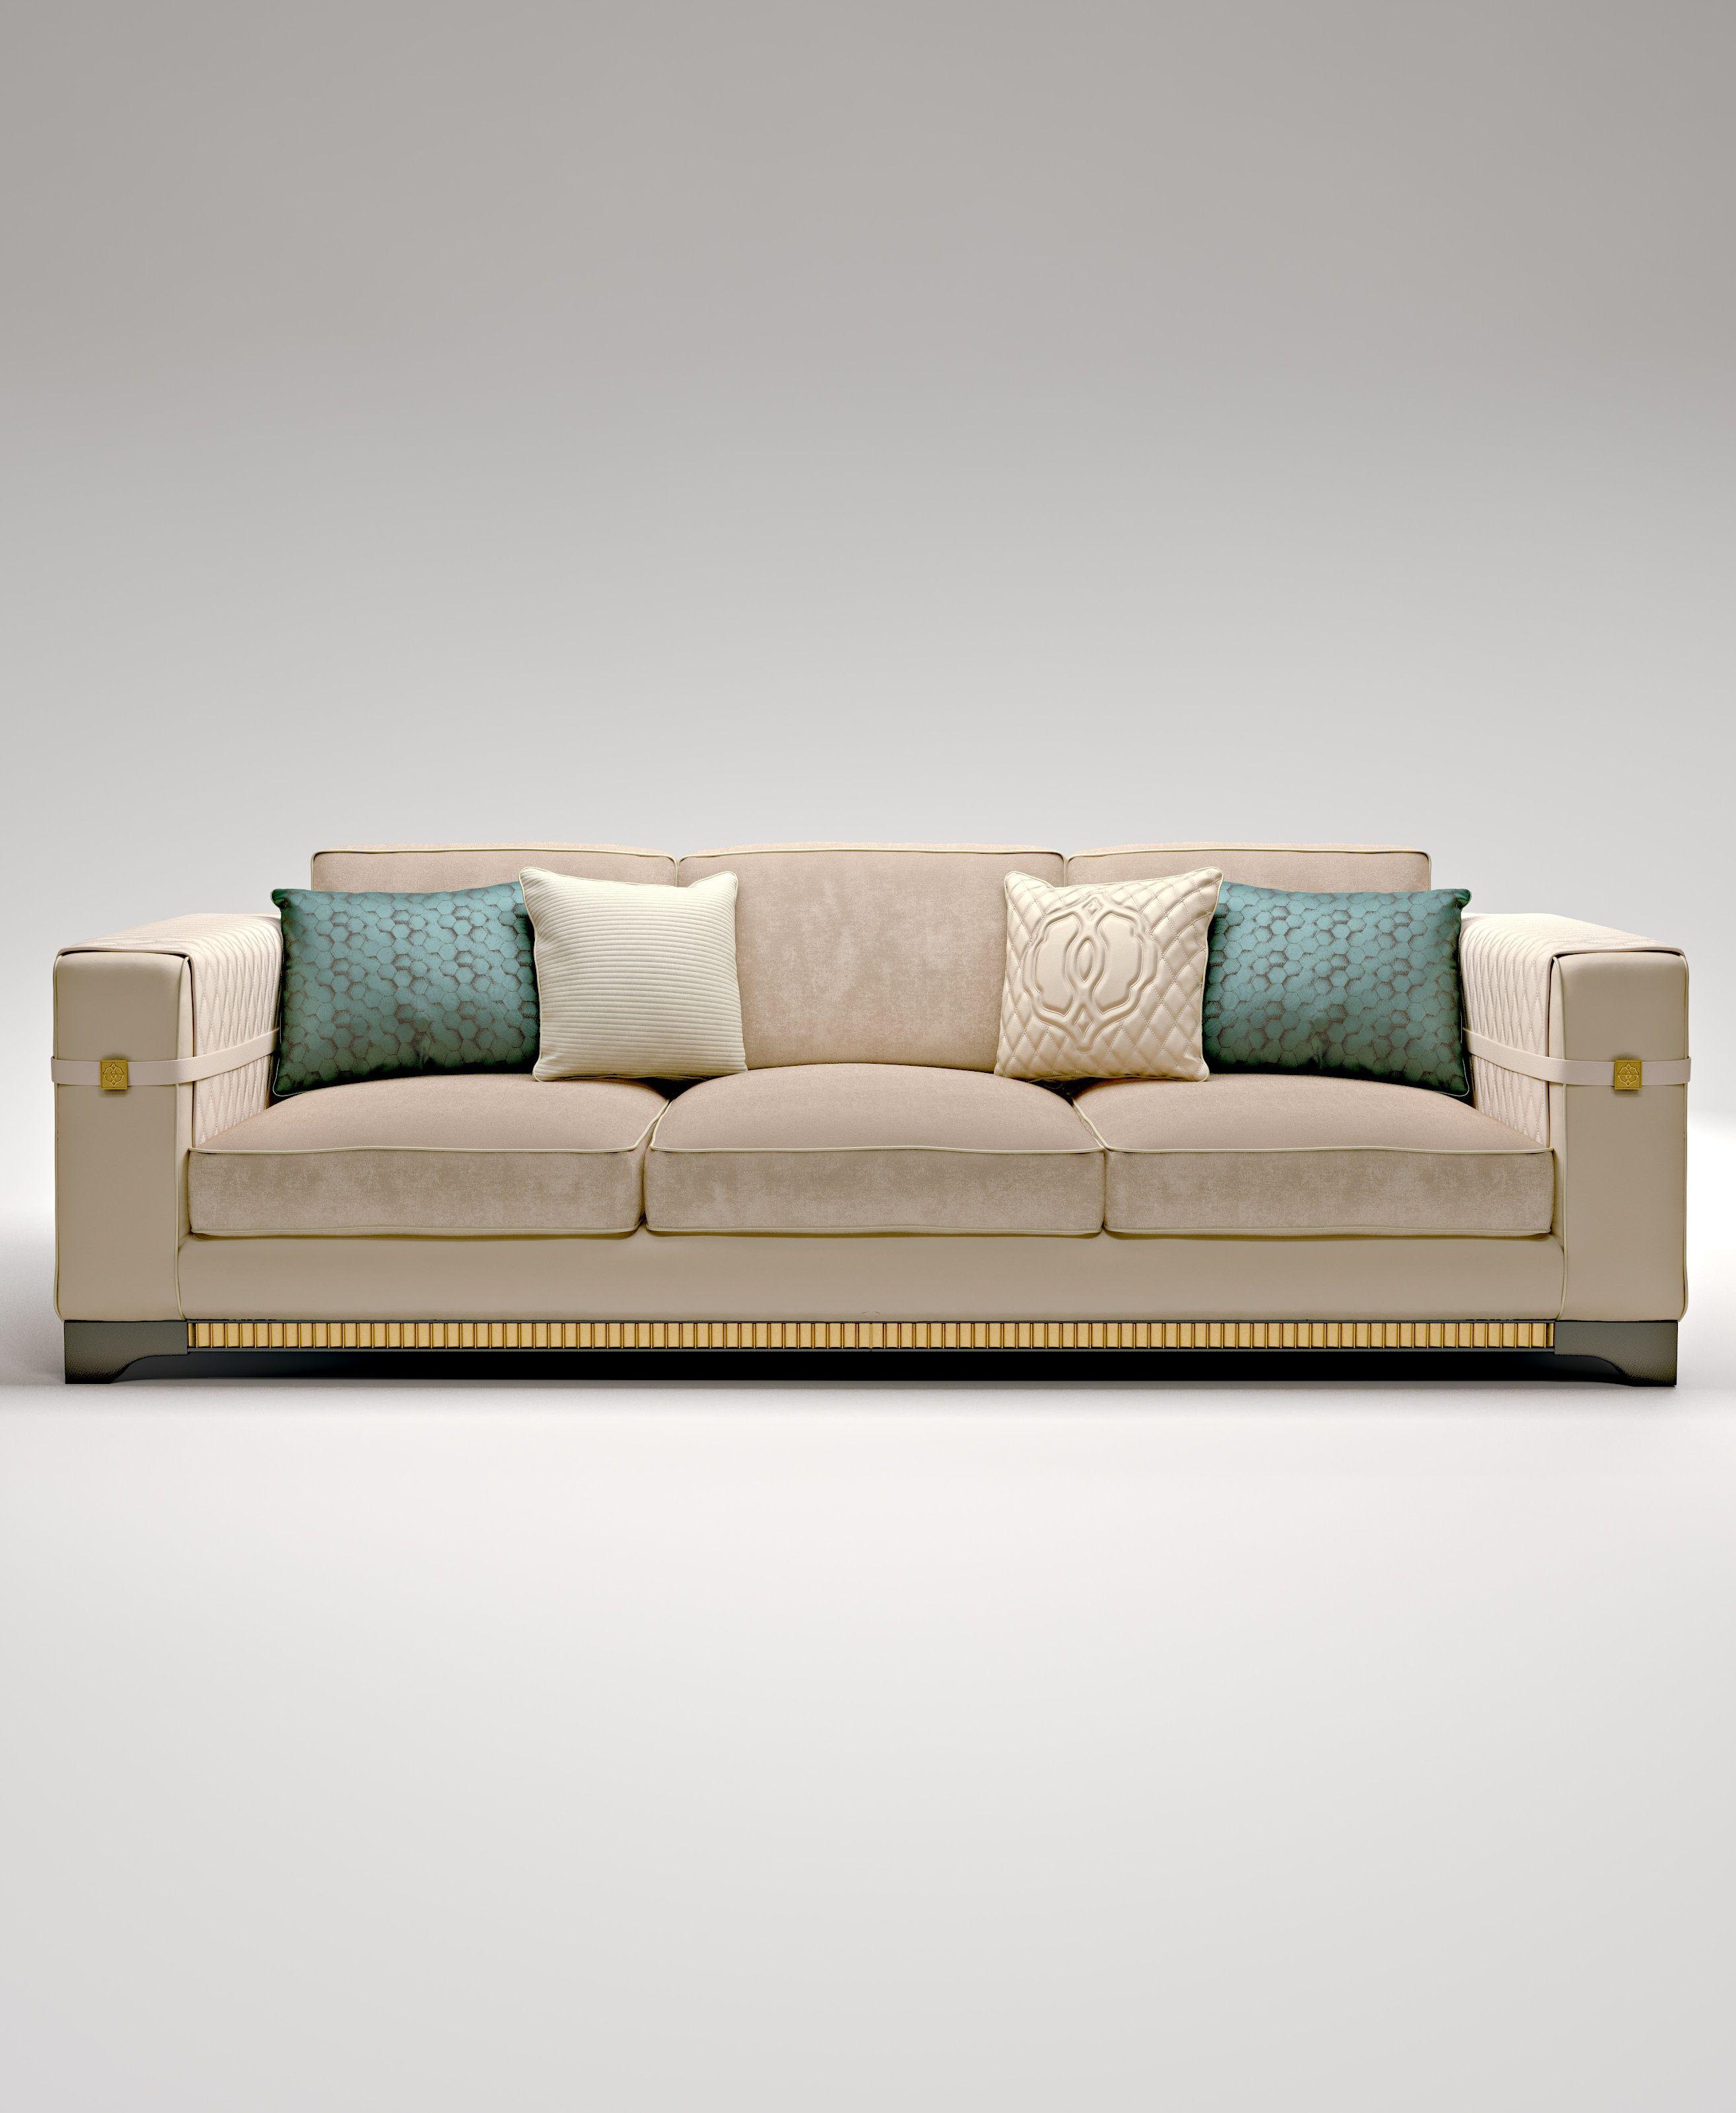 Amazon three seat sofa frame made of solid wood Bruno Zampa